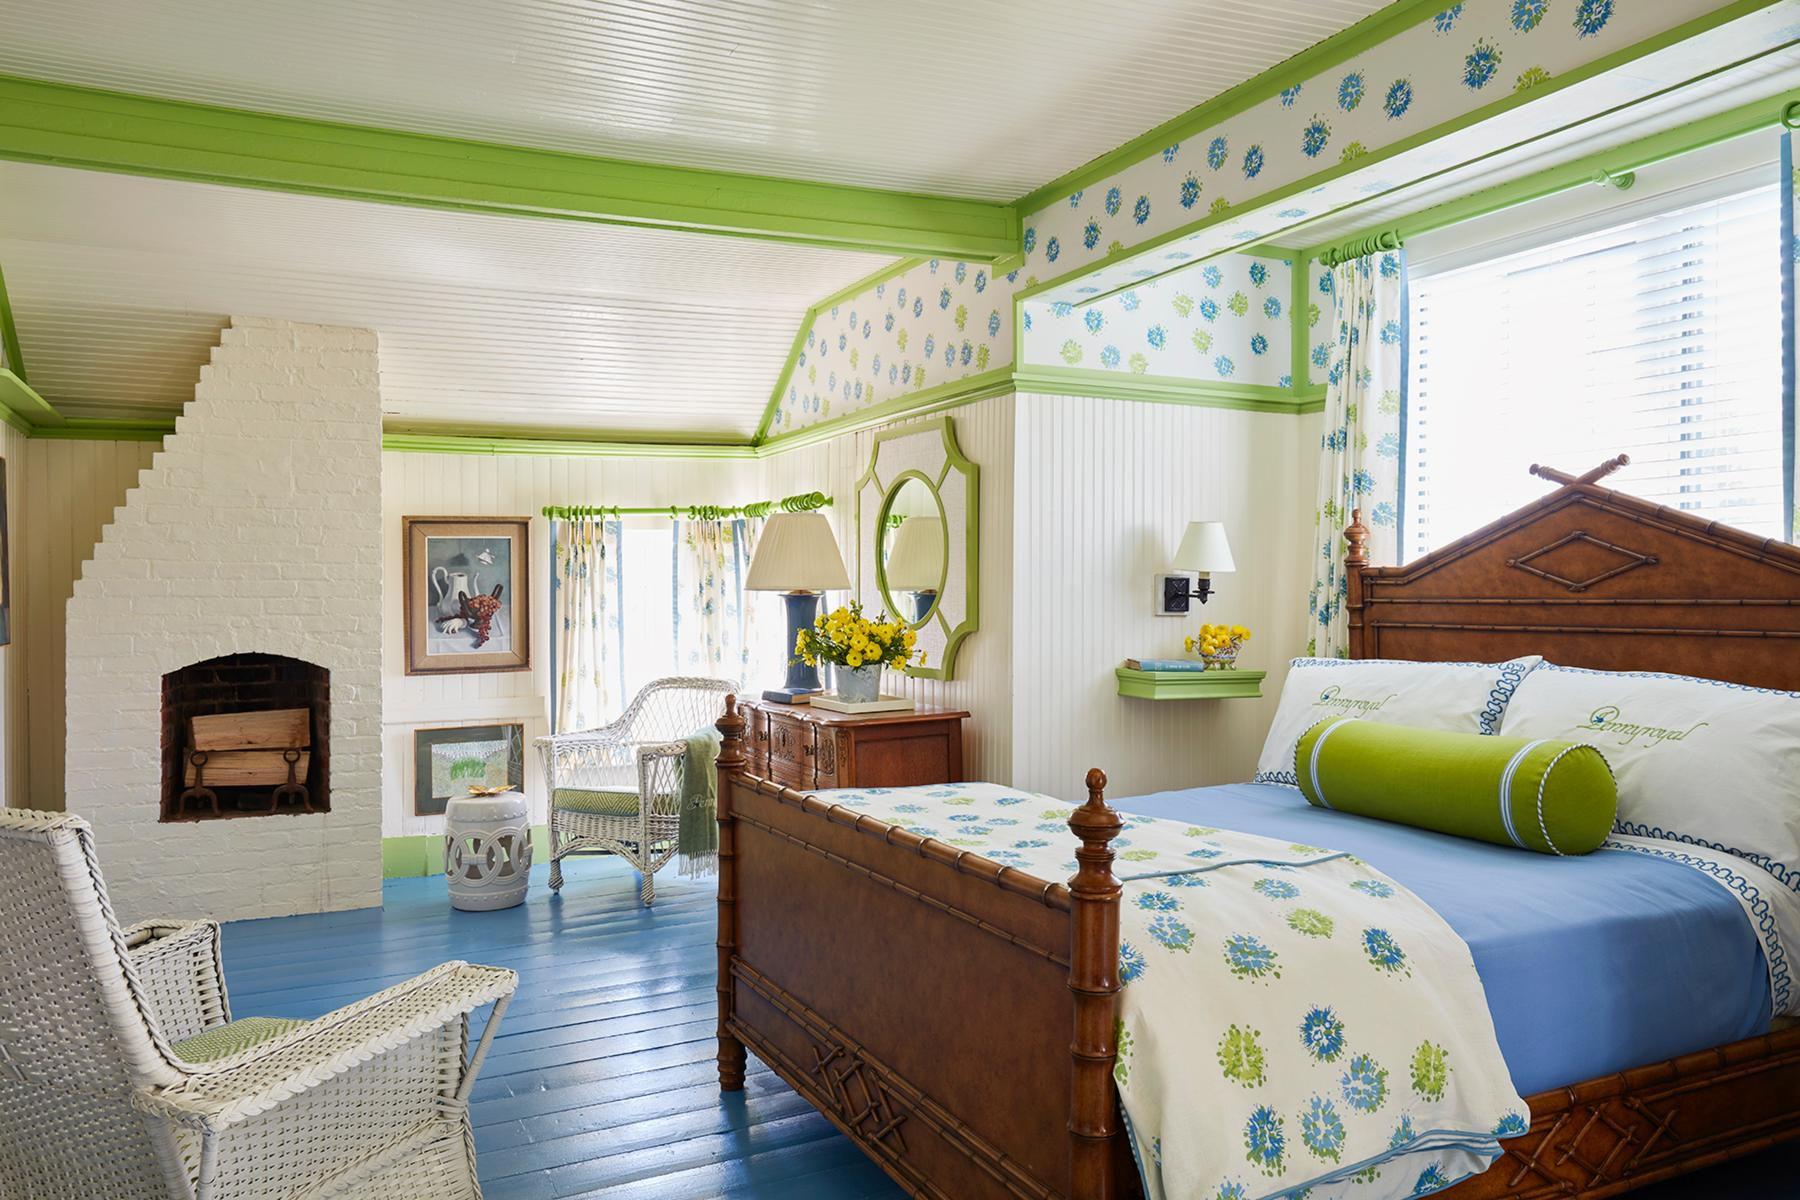 amanda-reynal-bedroom-pennyroyal-1554818374.jpg